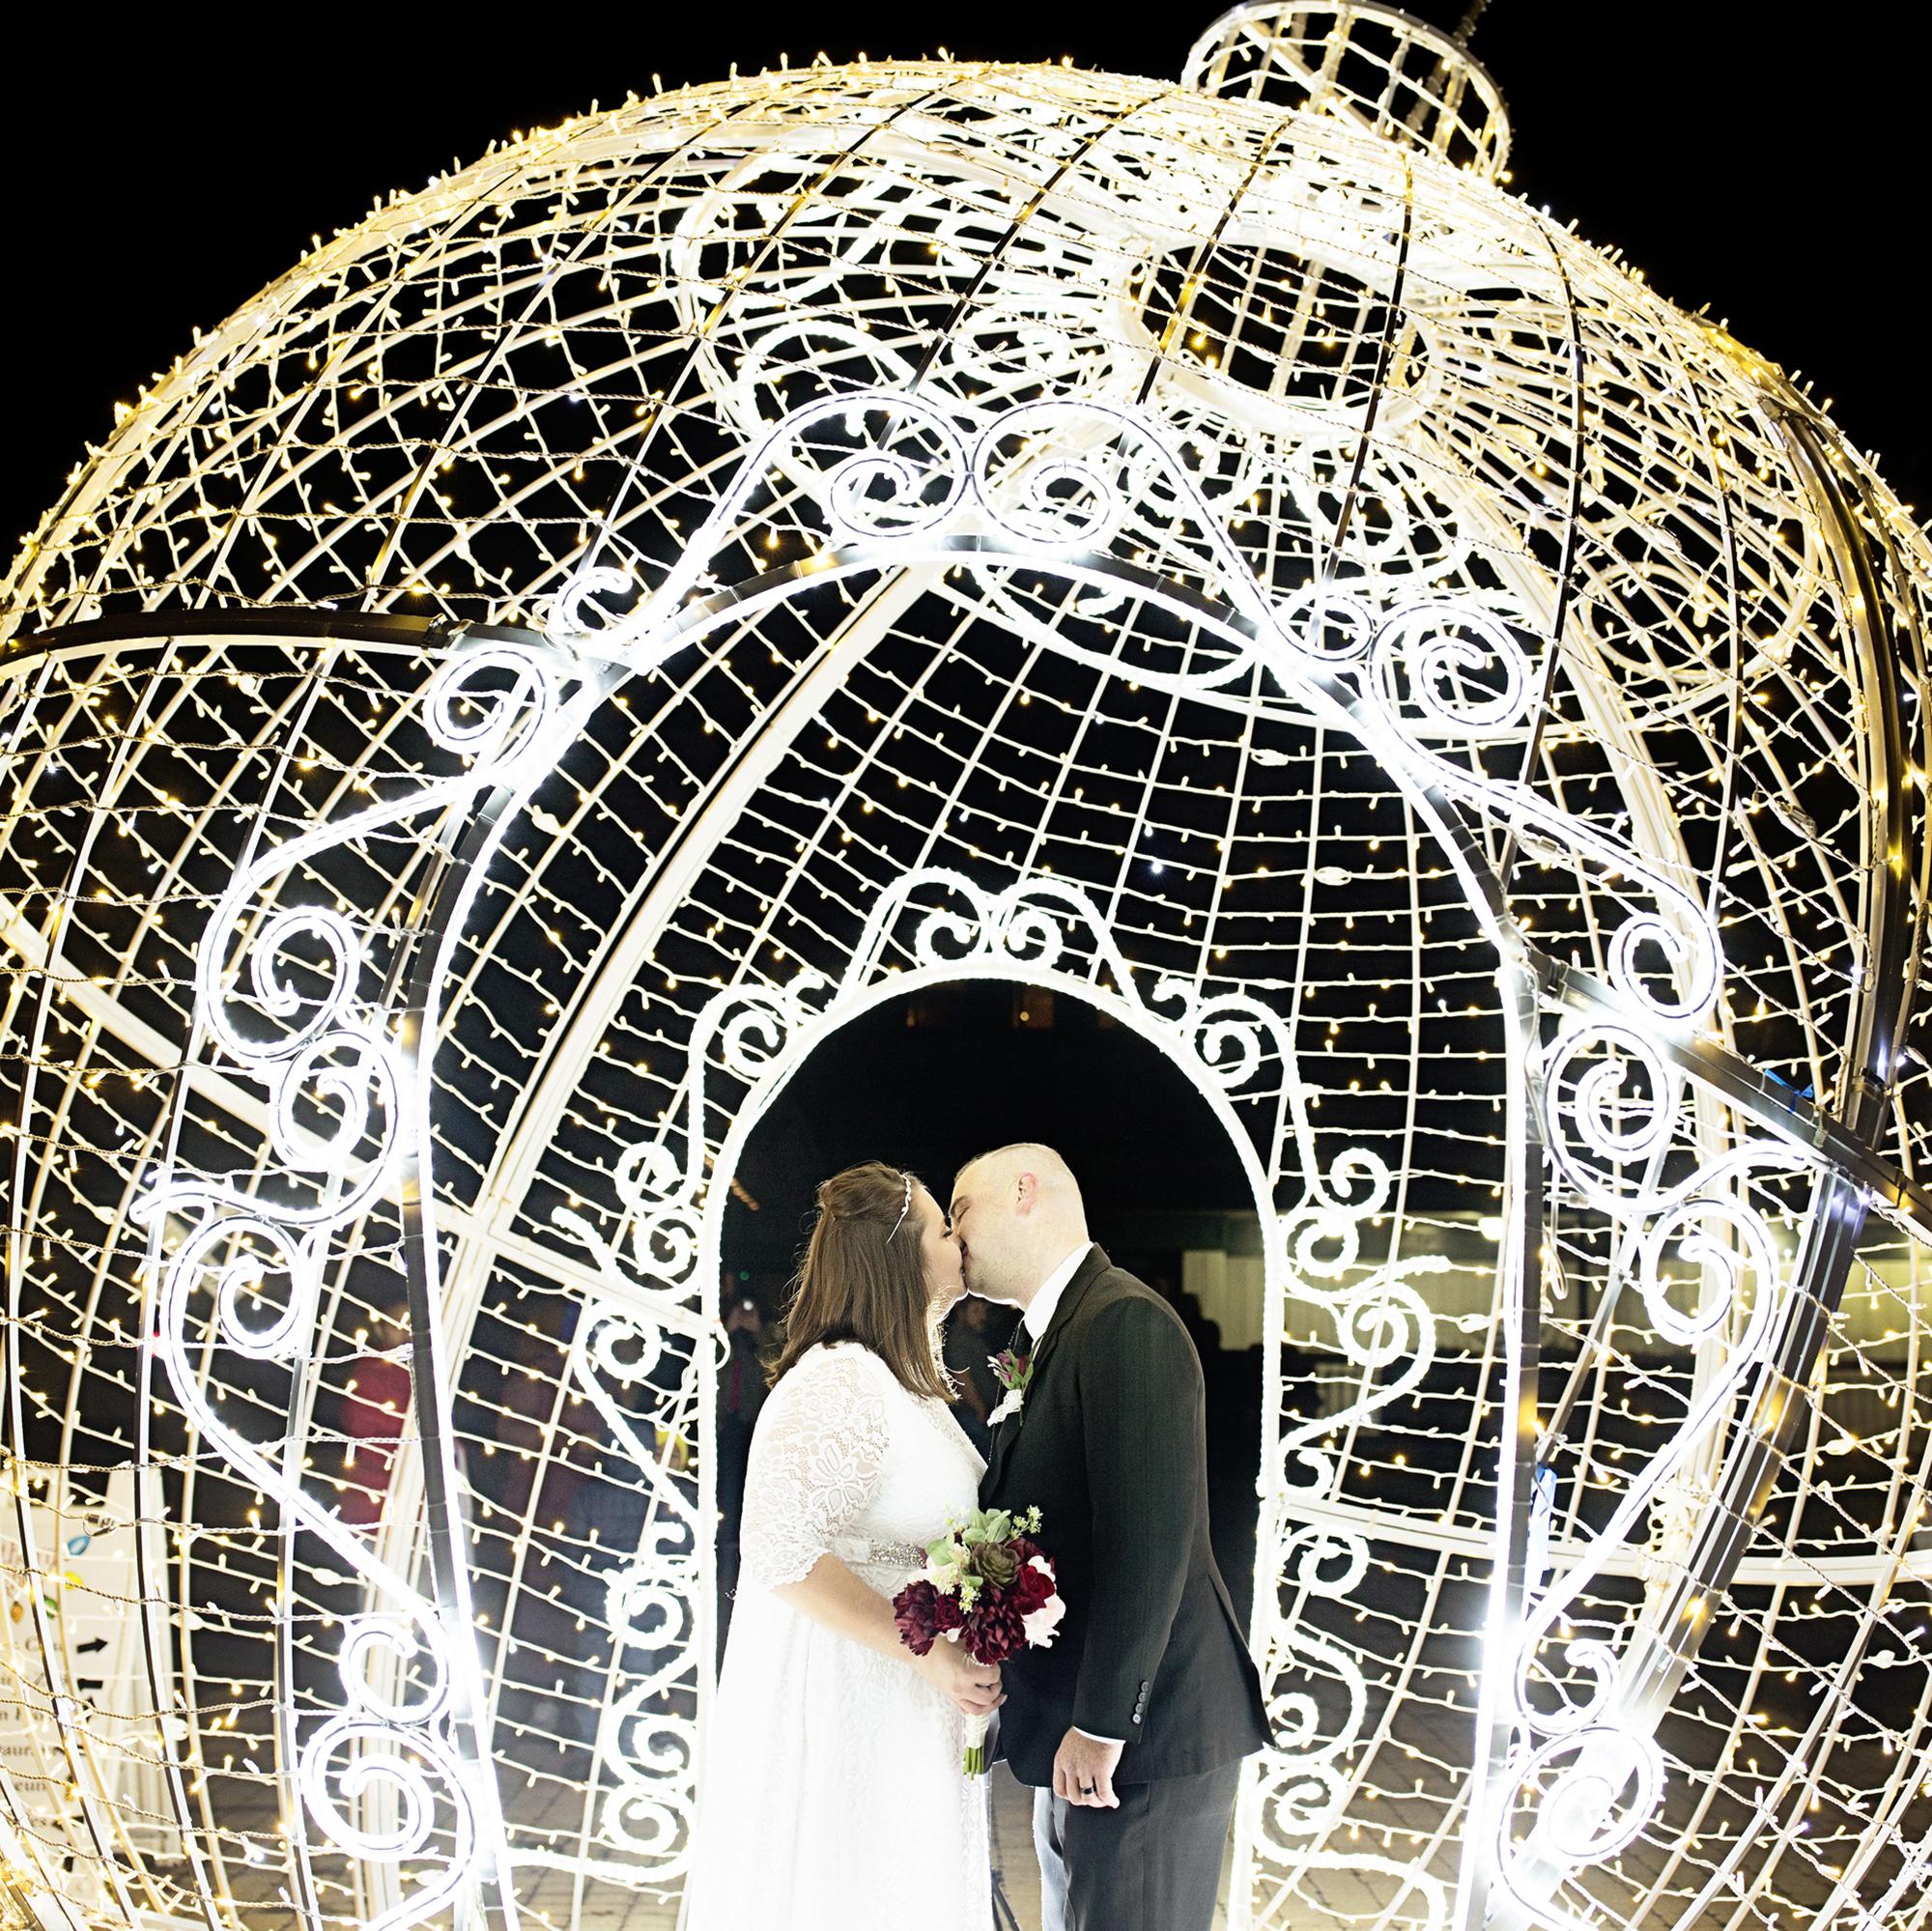 Seriously_Sabrina_Photography_Lexington_Kentucky_Horse_Park_Intimate_Wedding_Buchanan_25.jpg